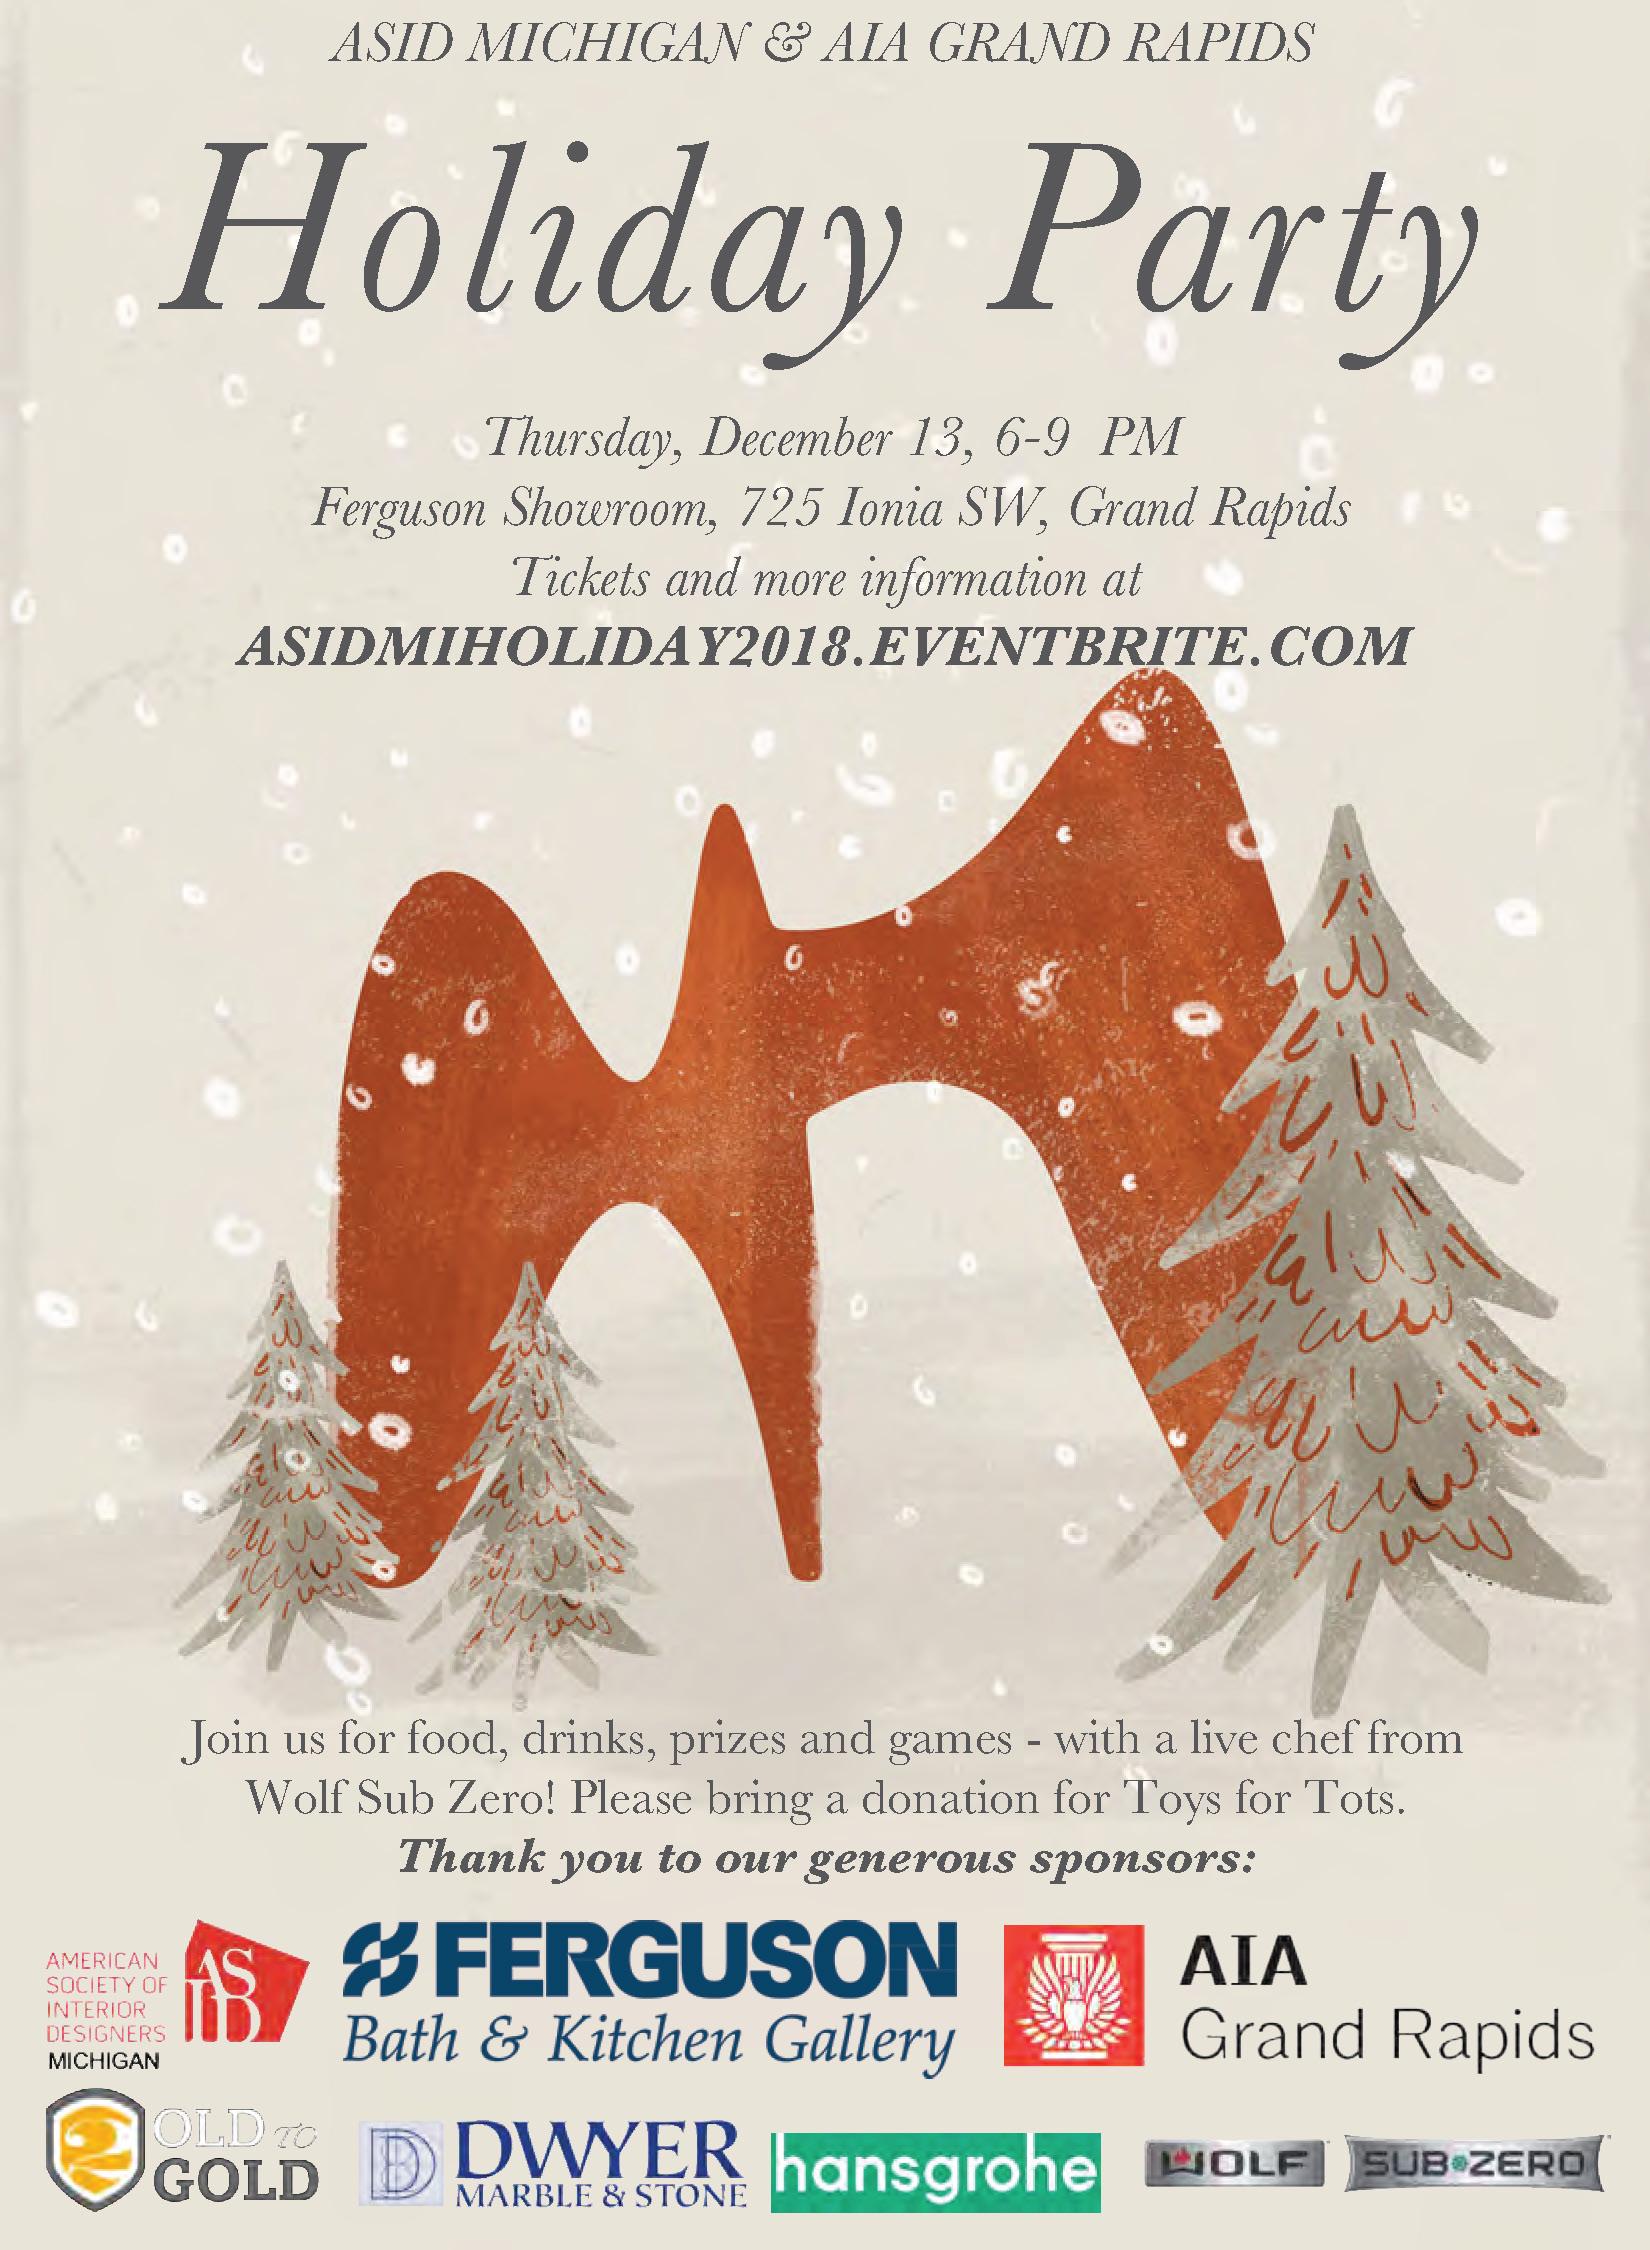 ASID AIAGR Holiday Party 2018 Invitation